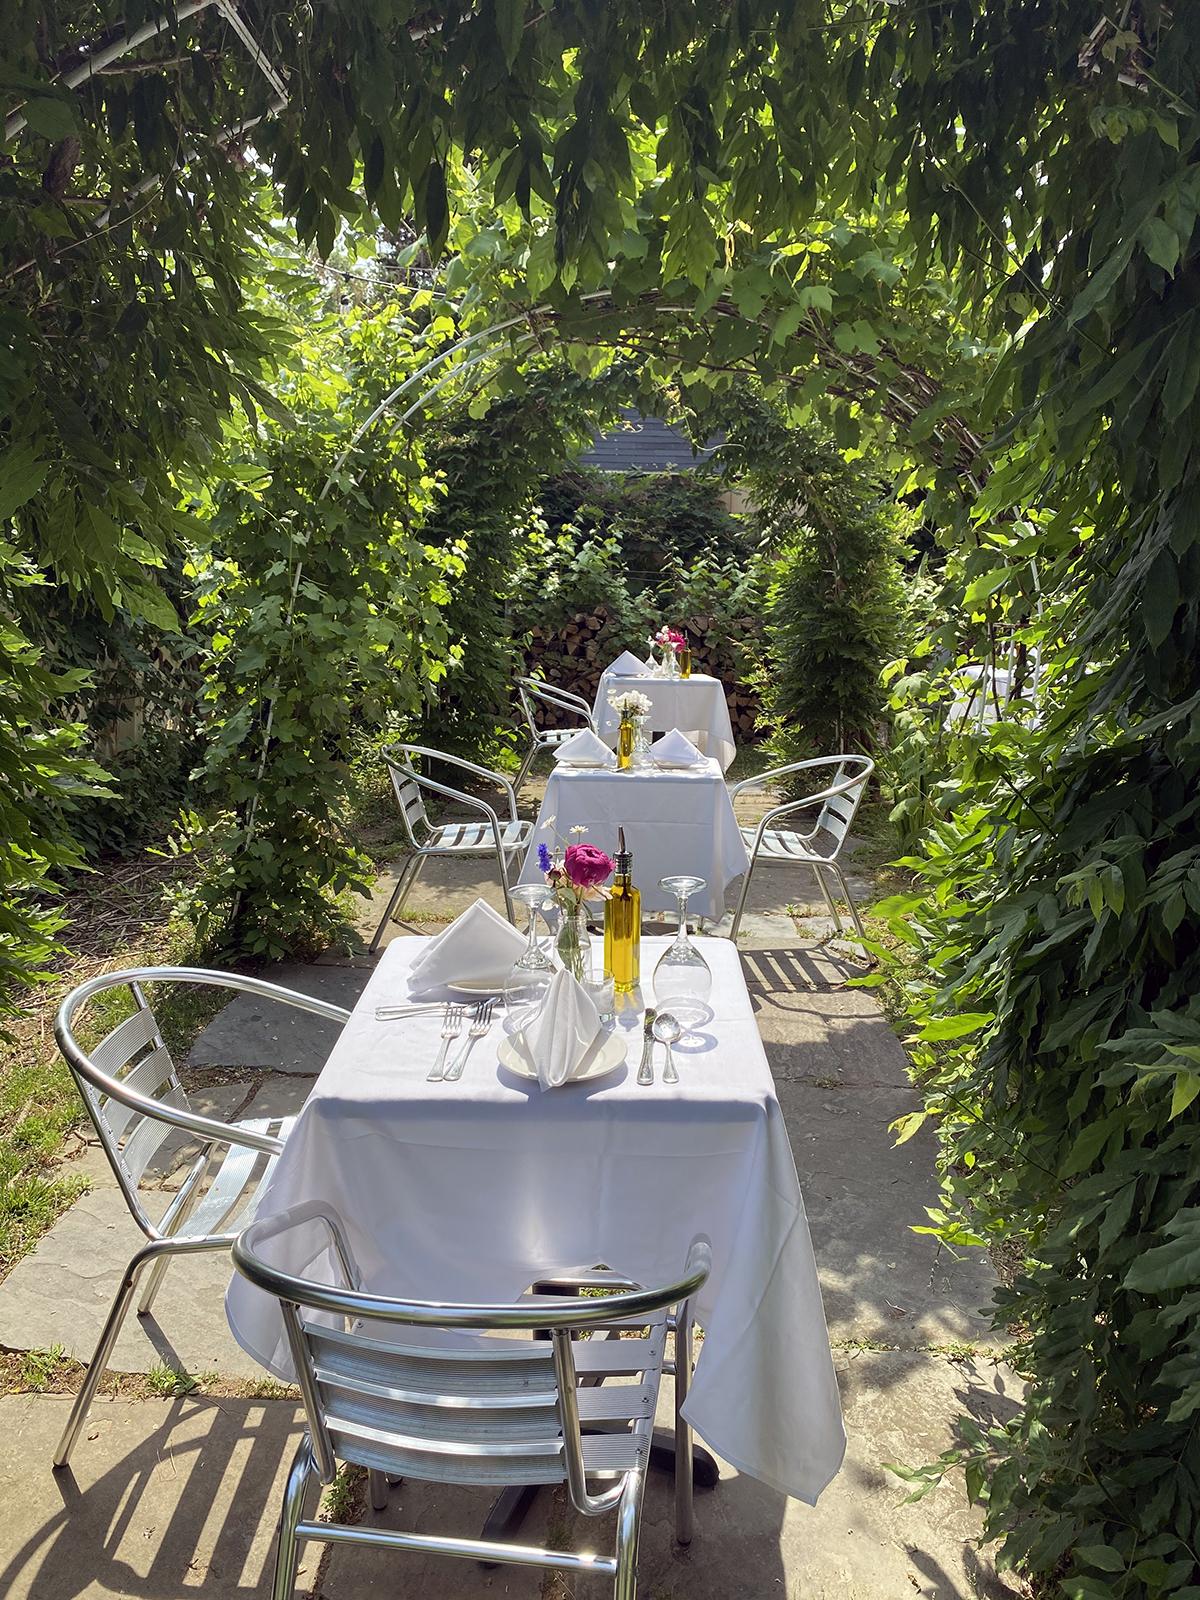 Outdoor dinning at IL Giardino in Aquebogue, NY